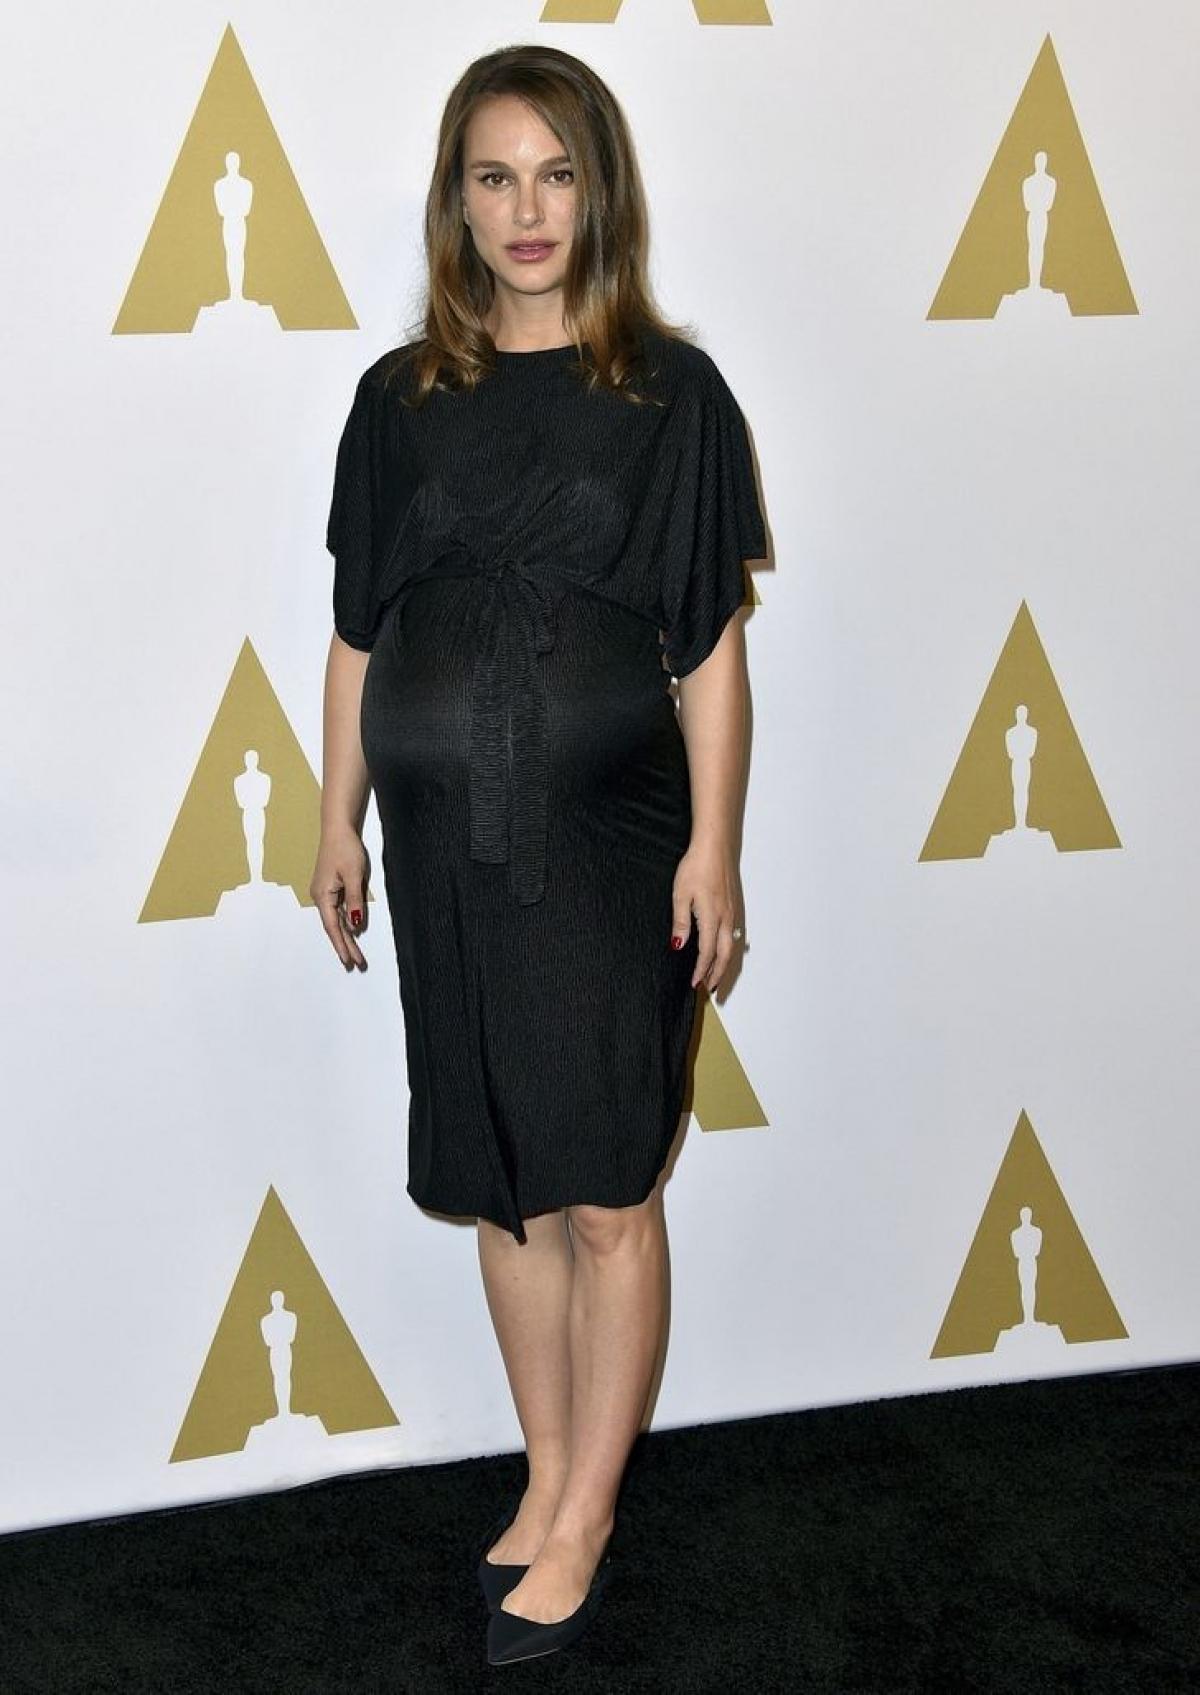 Natalie Portman mặc váy bầu màu đen của Topshop